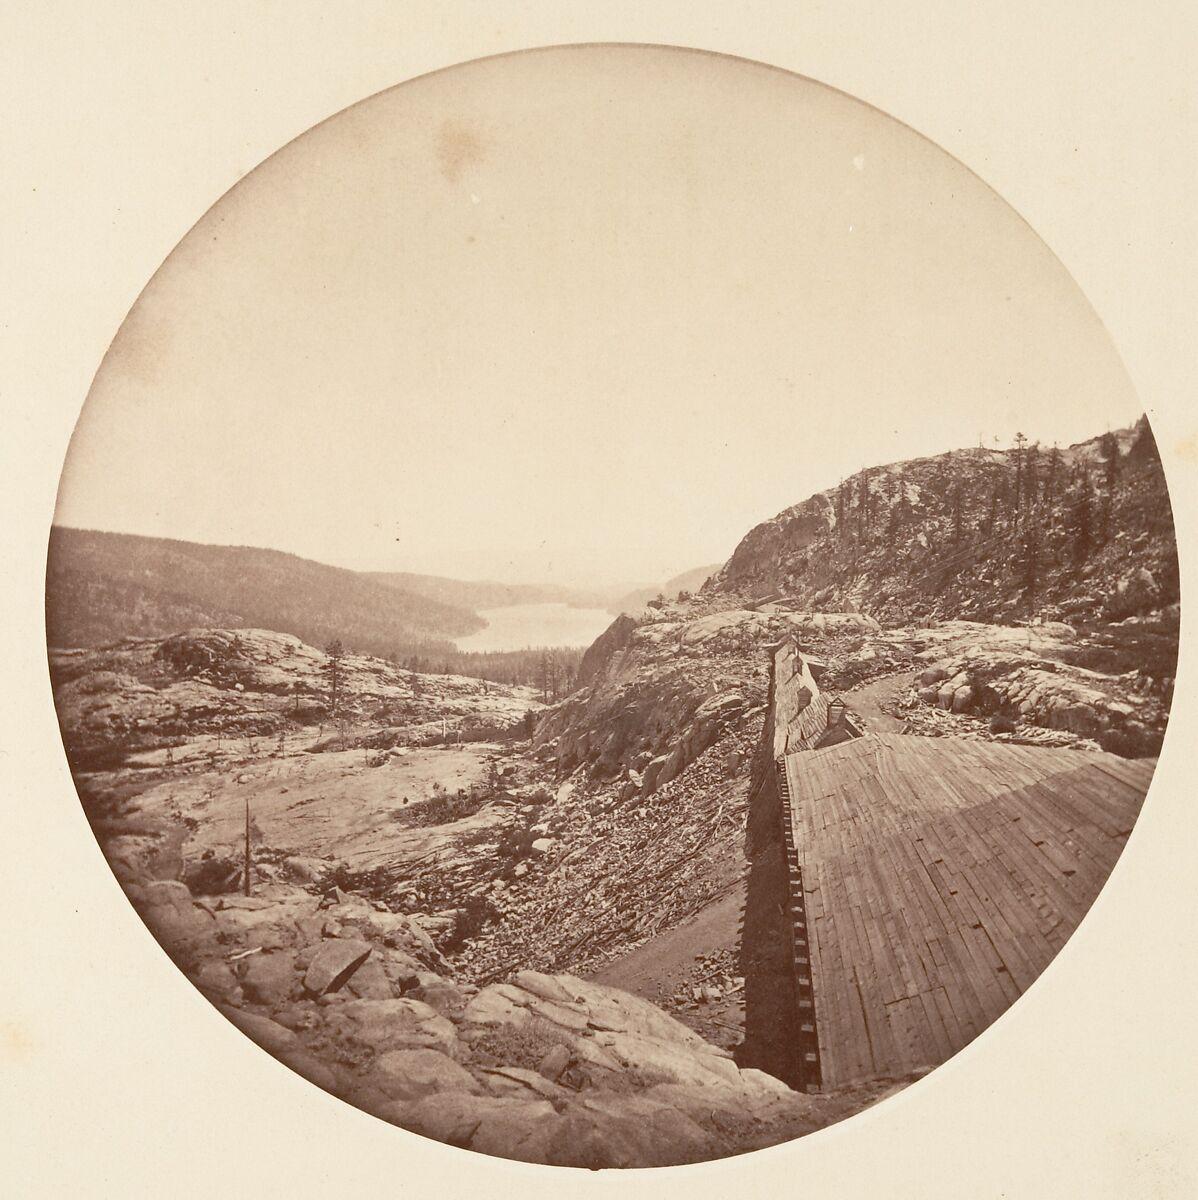 Carleton E. Watkins | [Yosemite National Park, California] | The Met